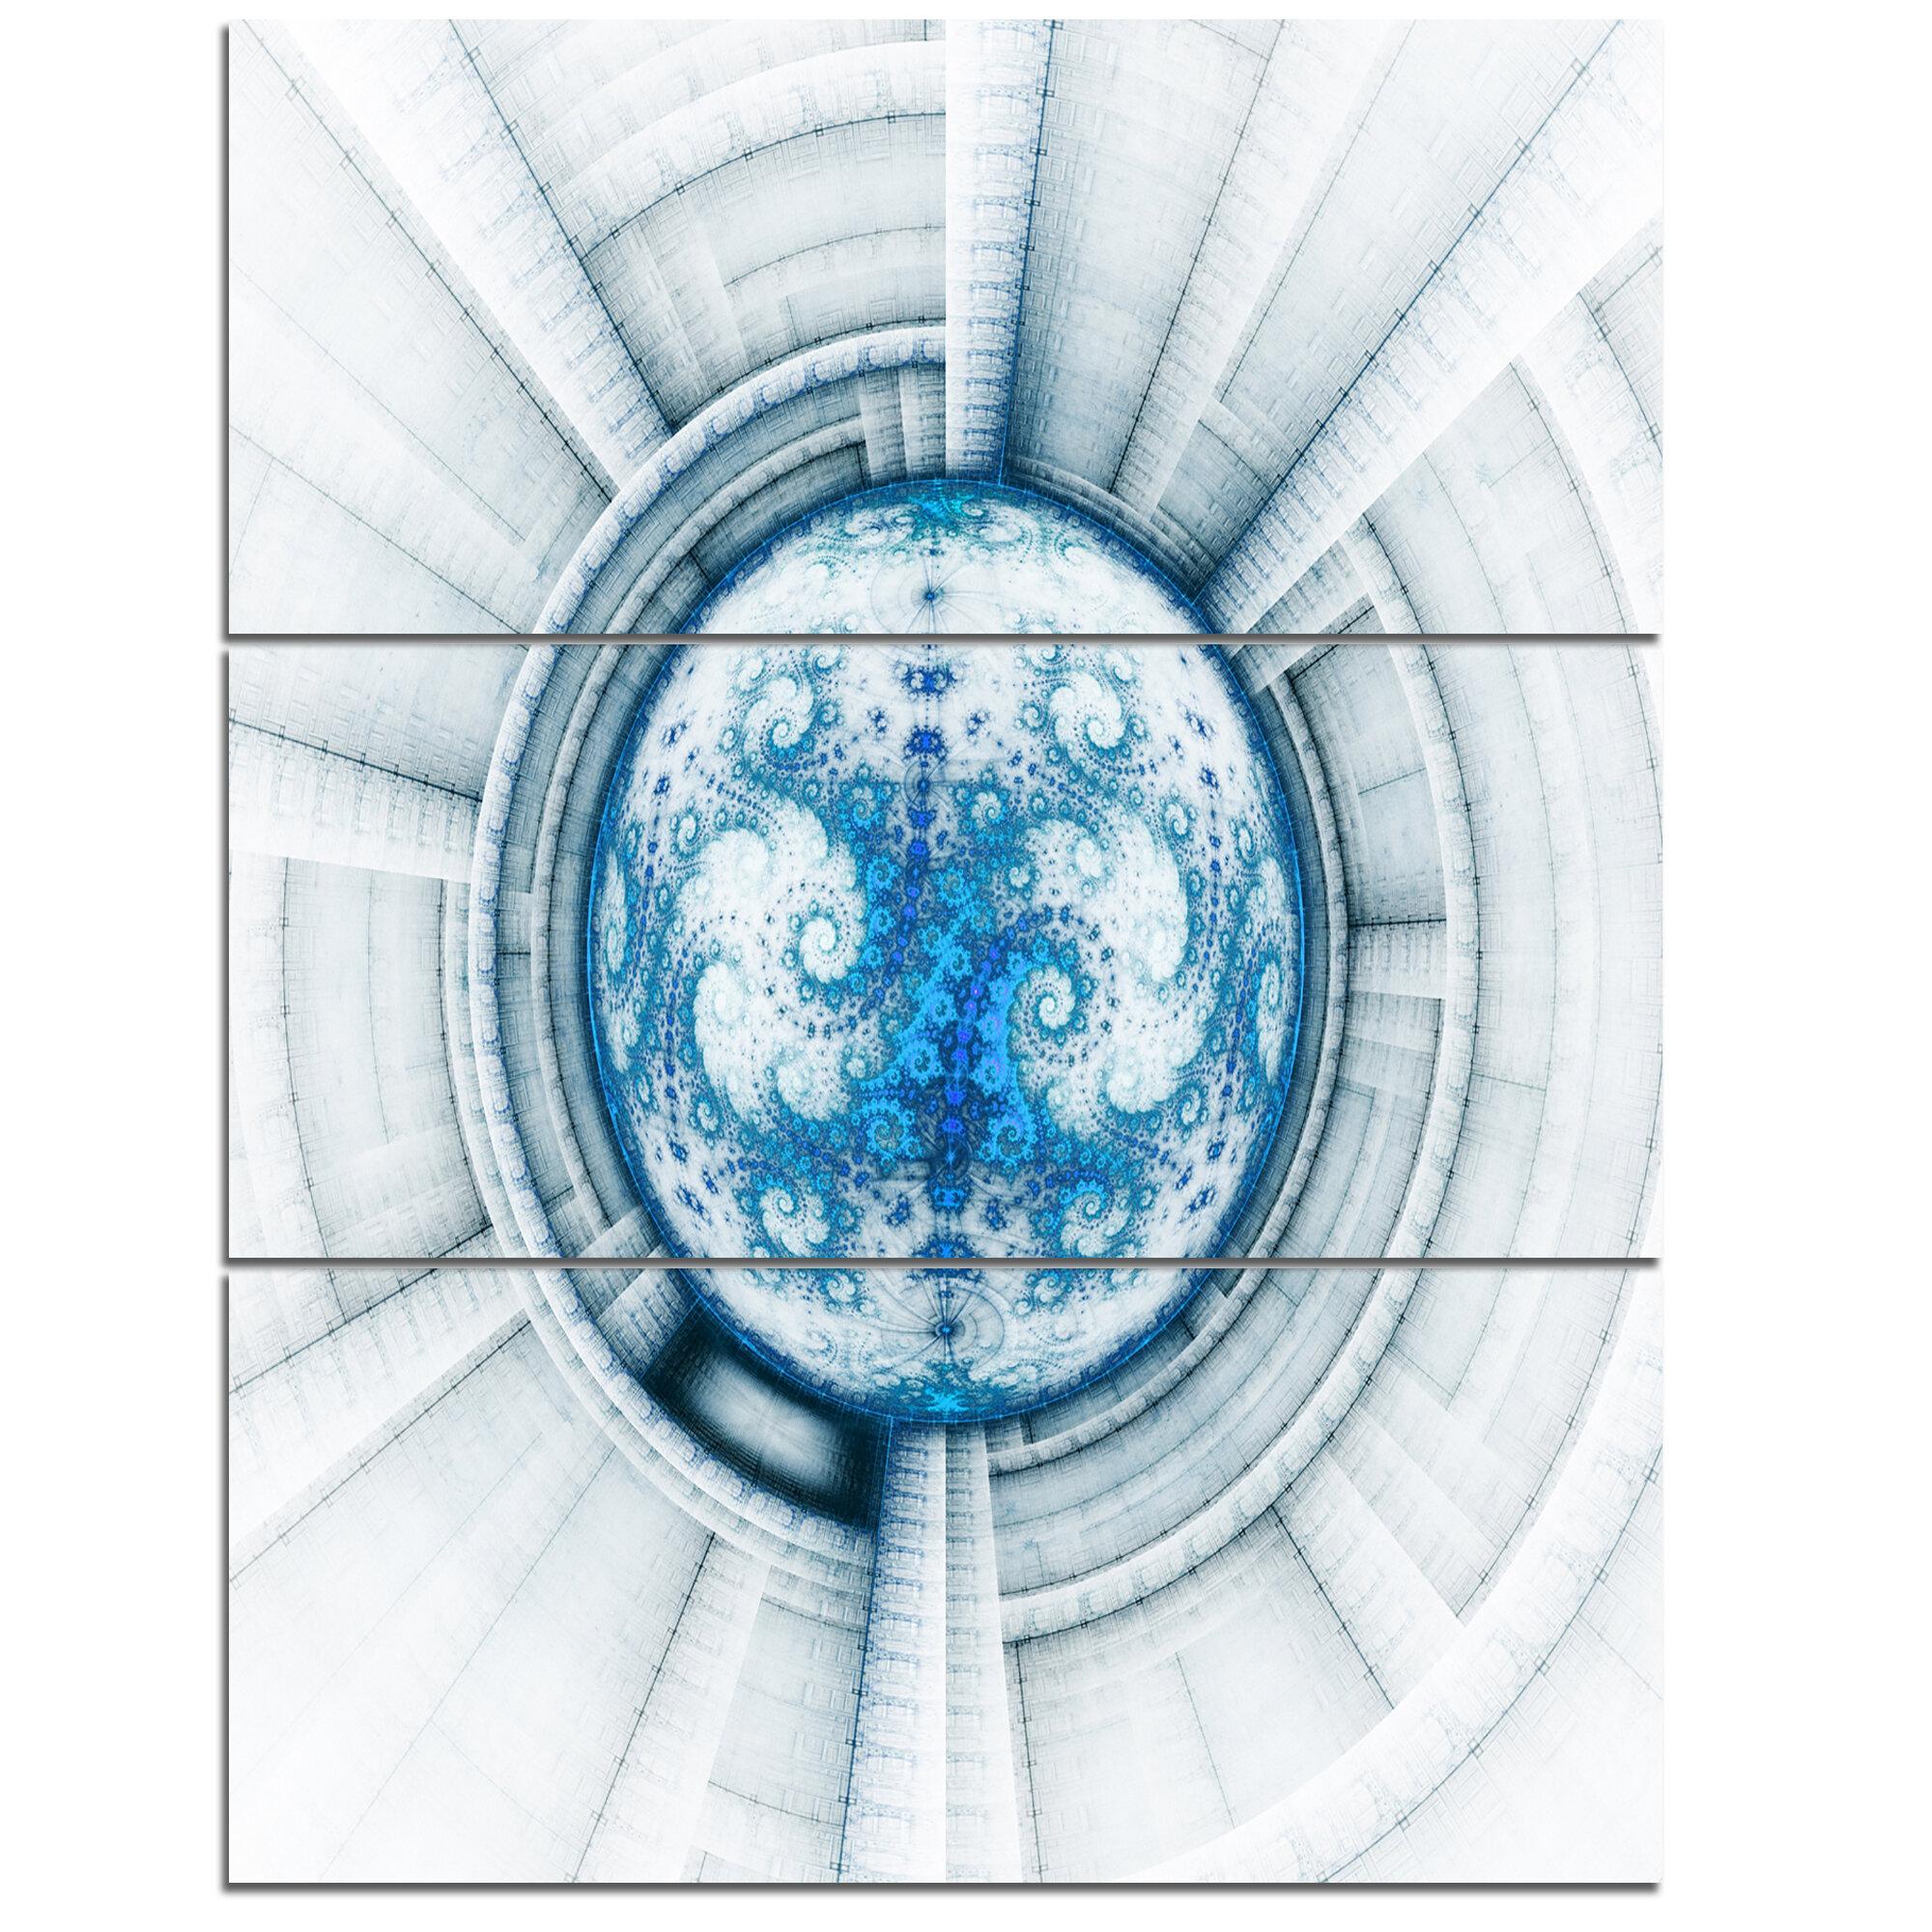 Designart Glowing Soft Blue Fractal Flower 3 Piece Graphic Art On Wrapped Canvas Set Wayfair